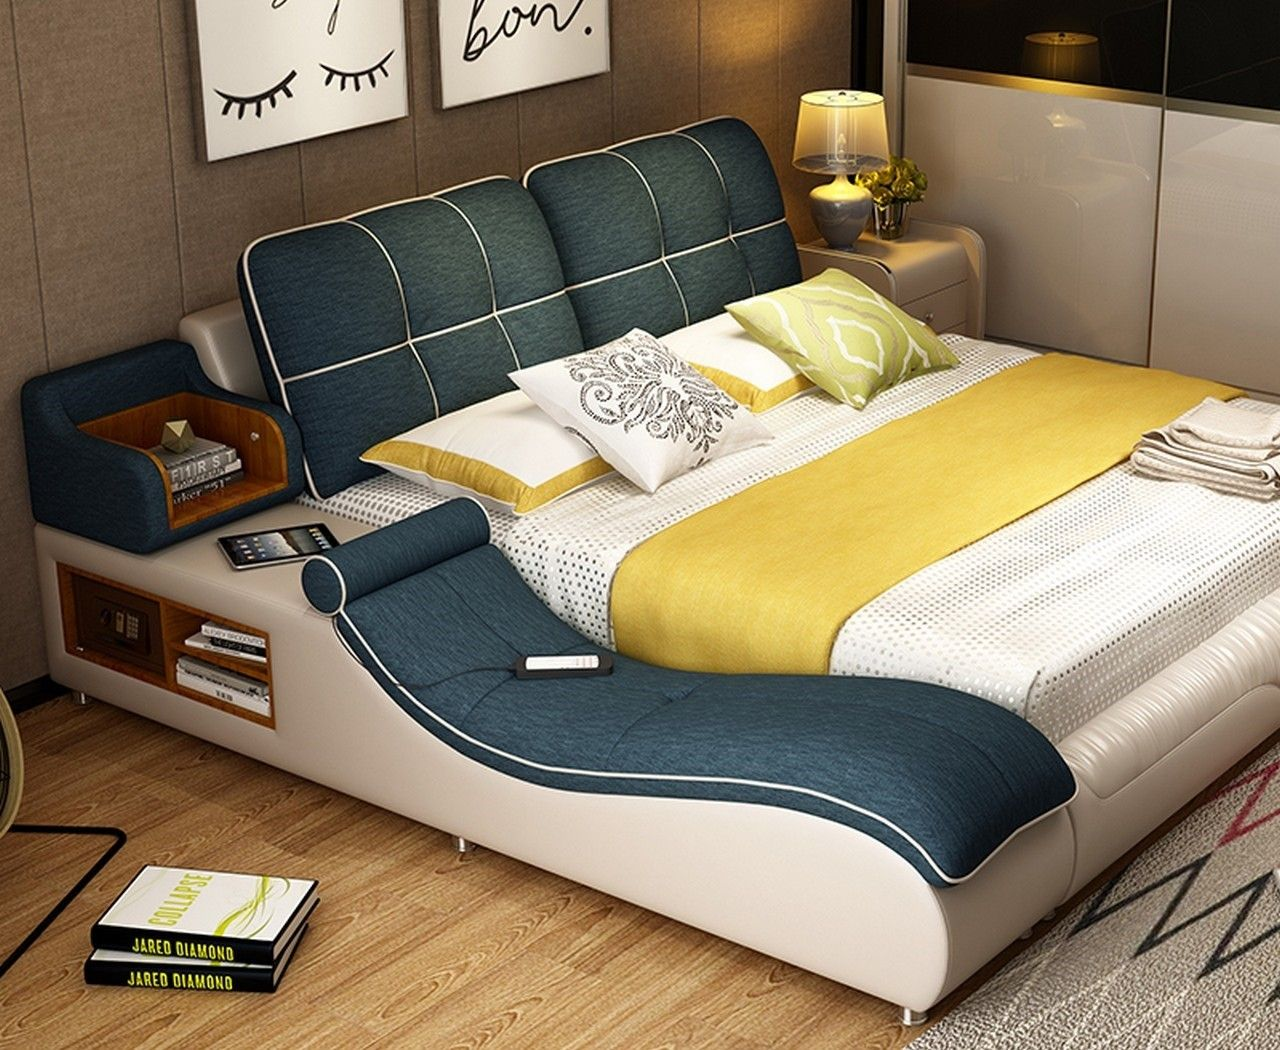 The Ultimate Bed New Bed Designs Bedroom Bed Design Bed Design